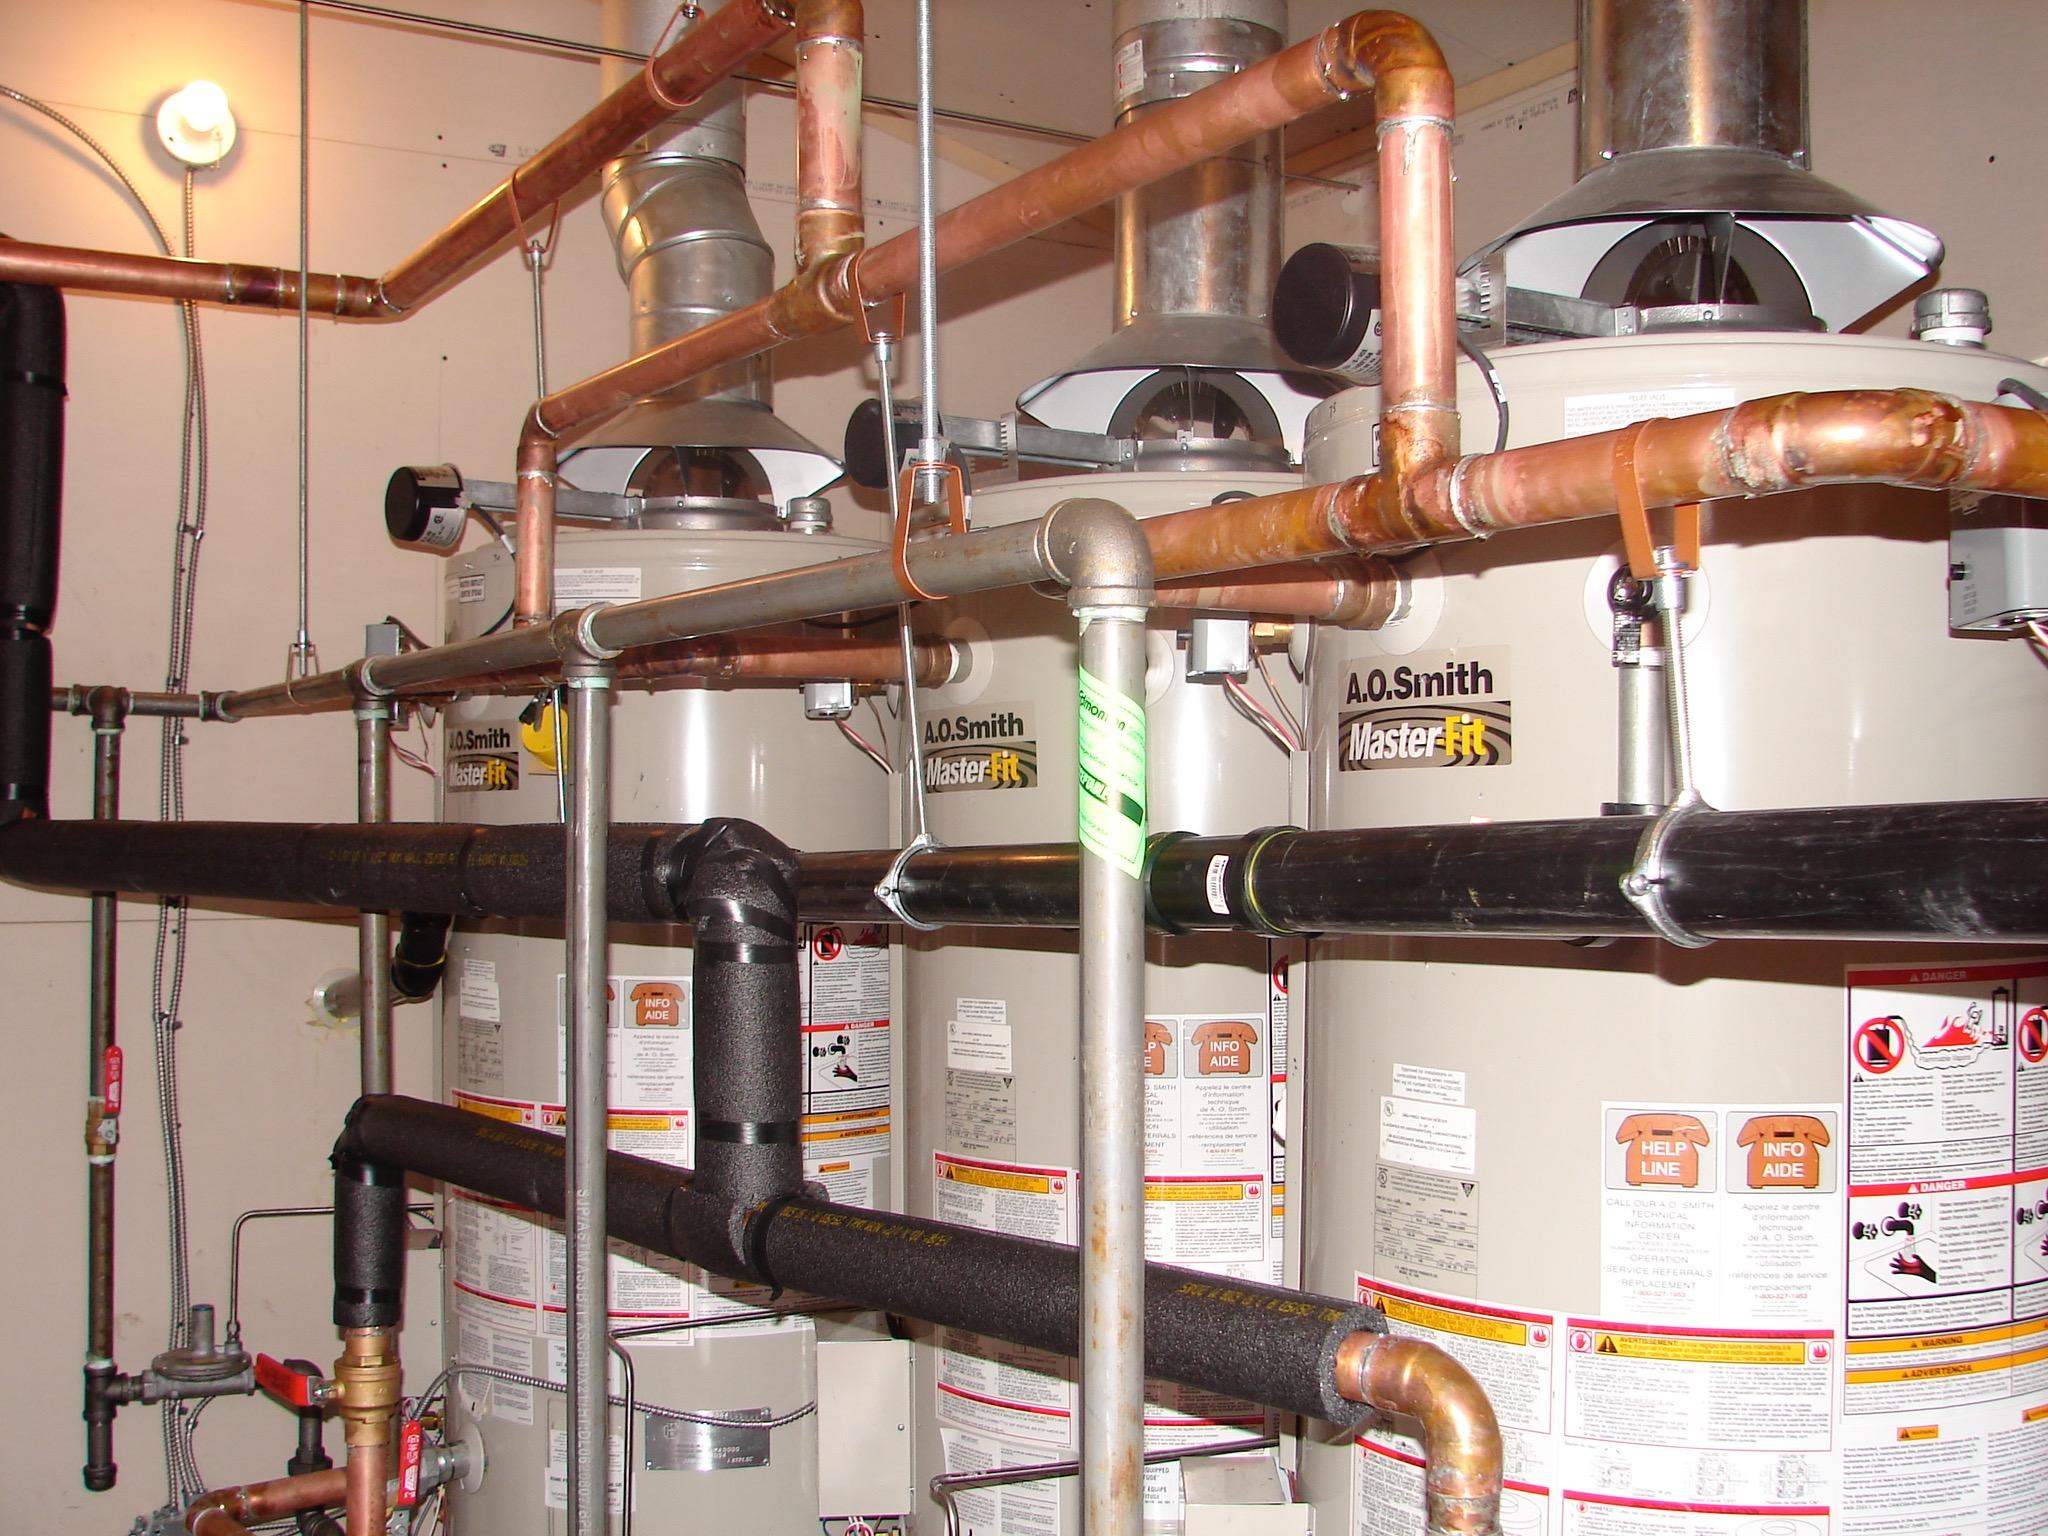 PB05  Plumbing - General Contractors Commercial Renovations in Edmonton, Office and Warehouse Project Contractors